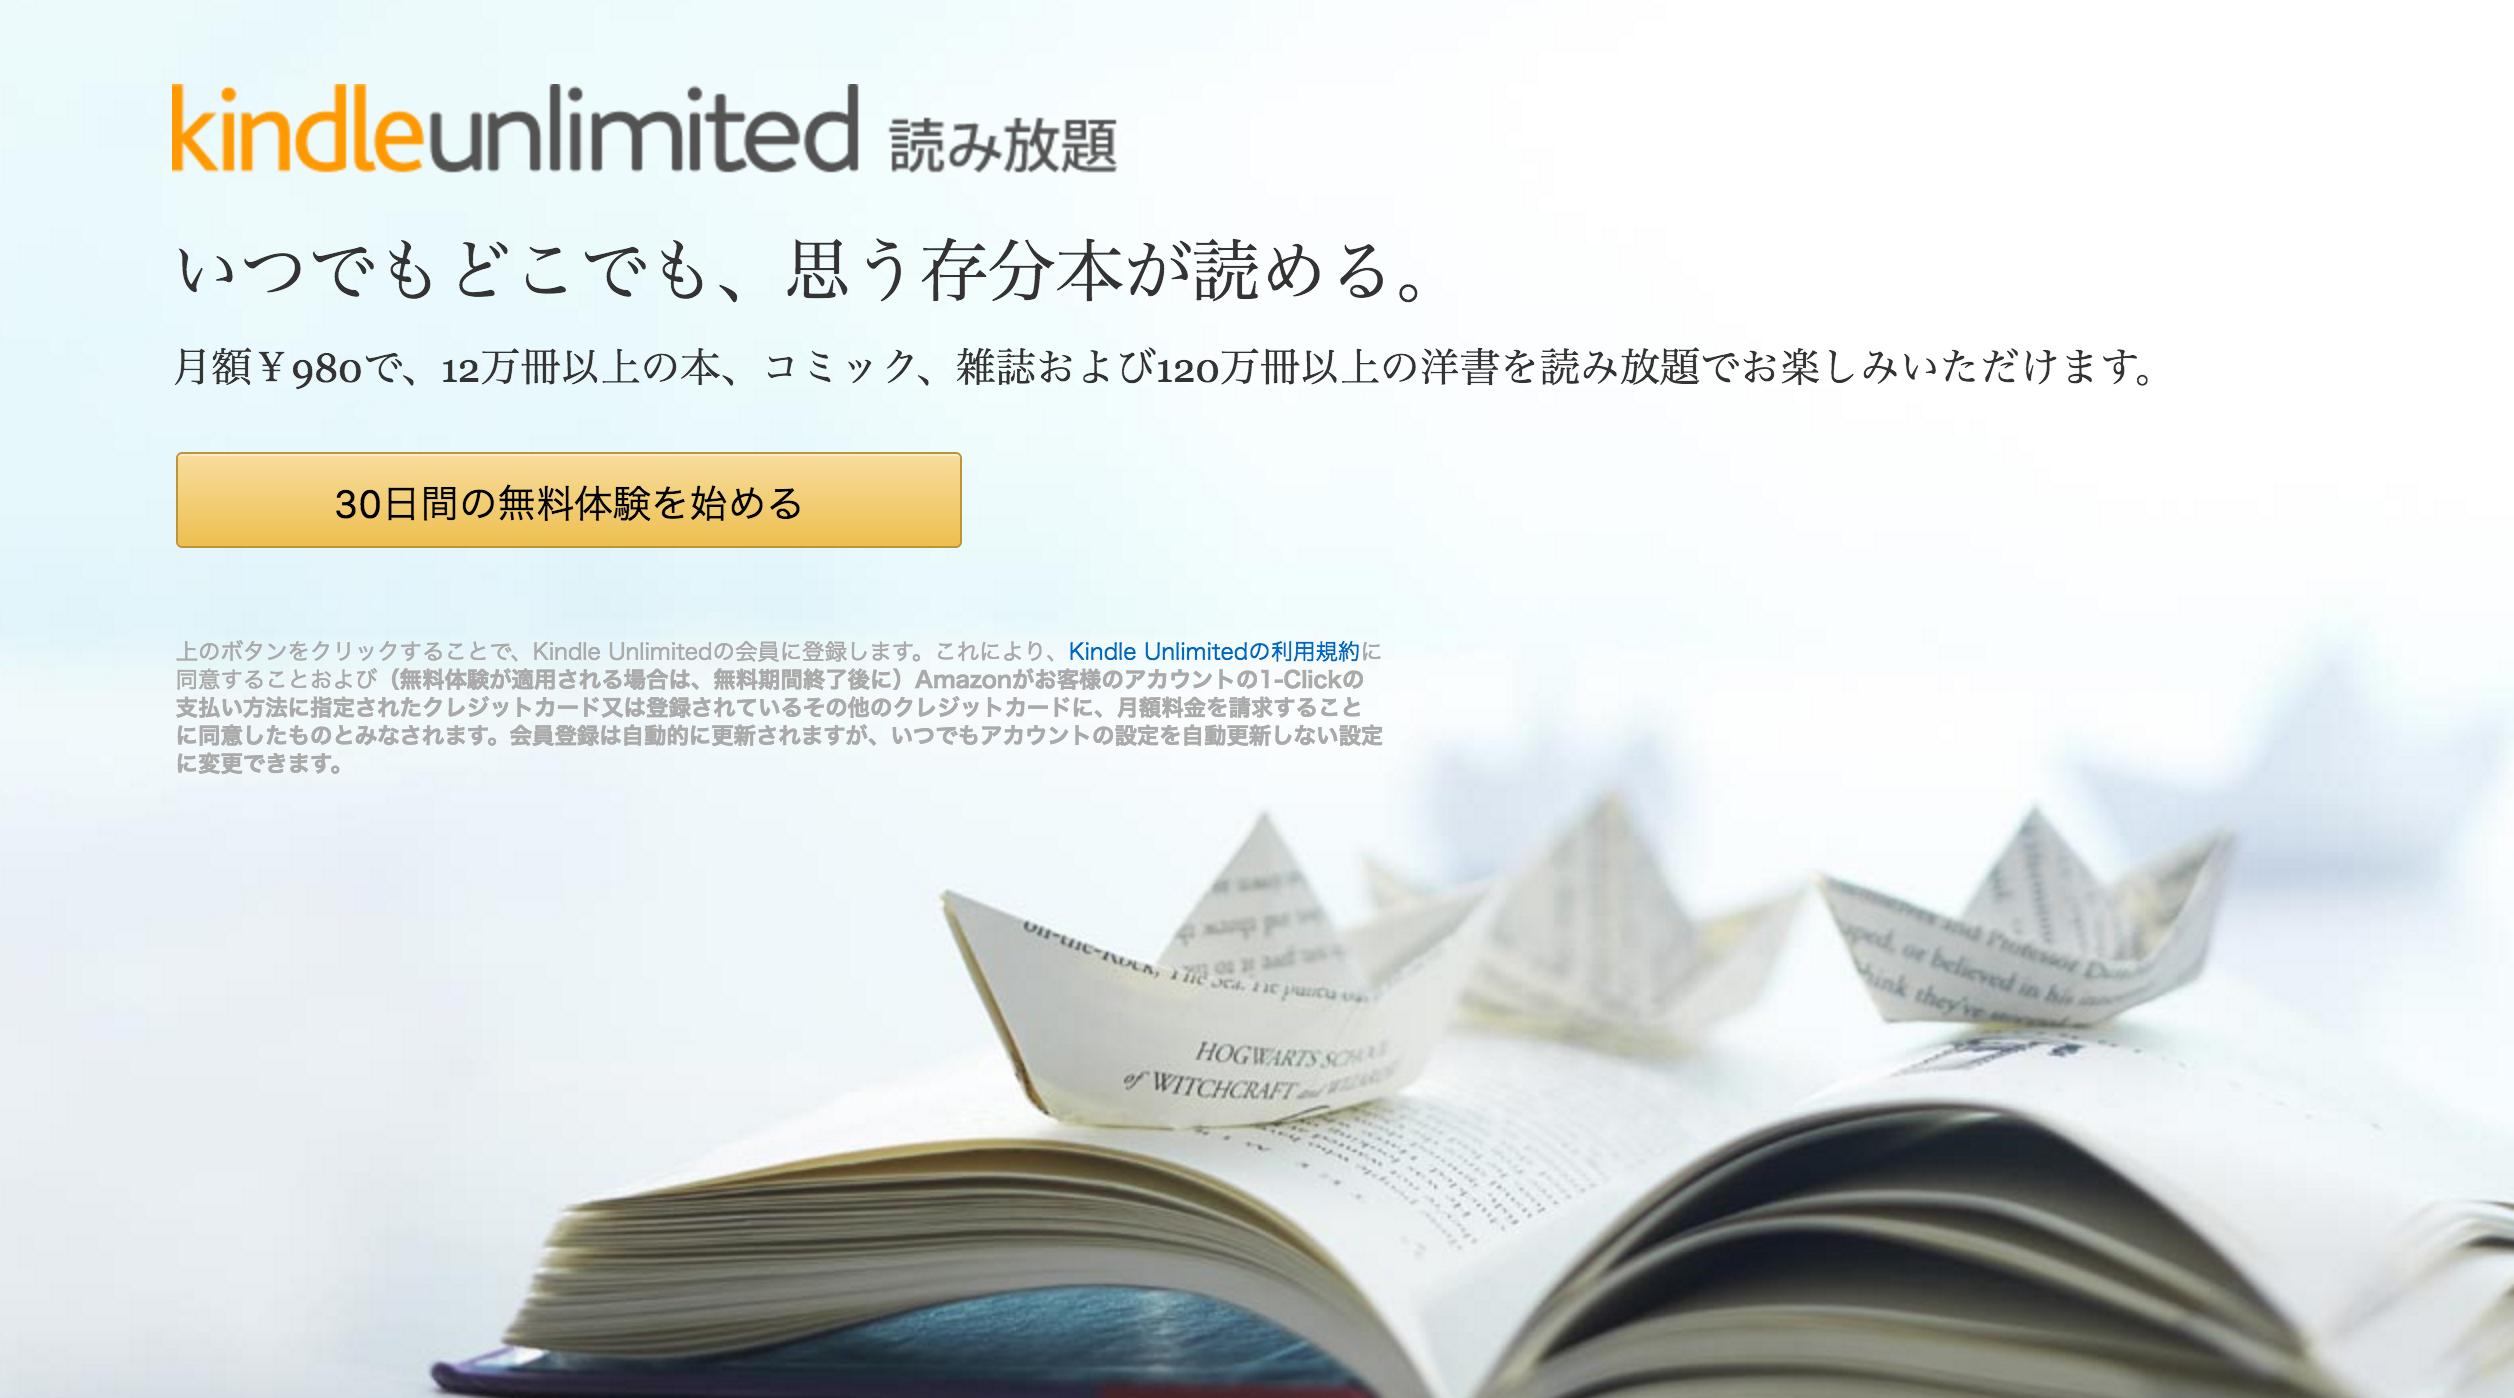 Kindleで12万冊読み放題スタート! すぐに月額980円の元が取れるラインナップを紹介します